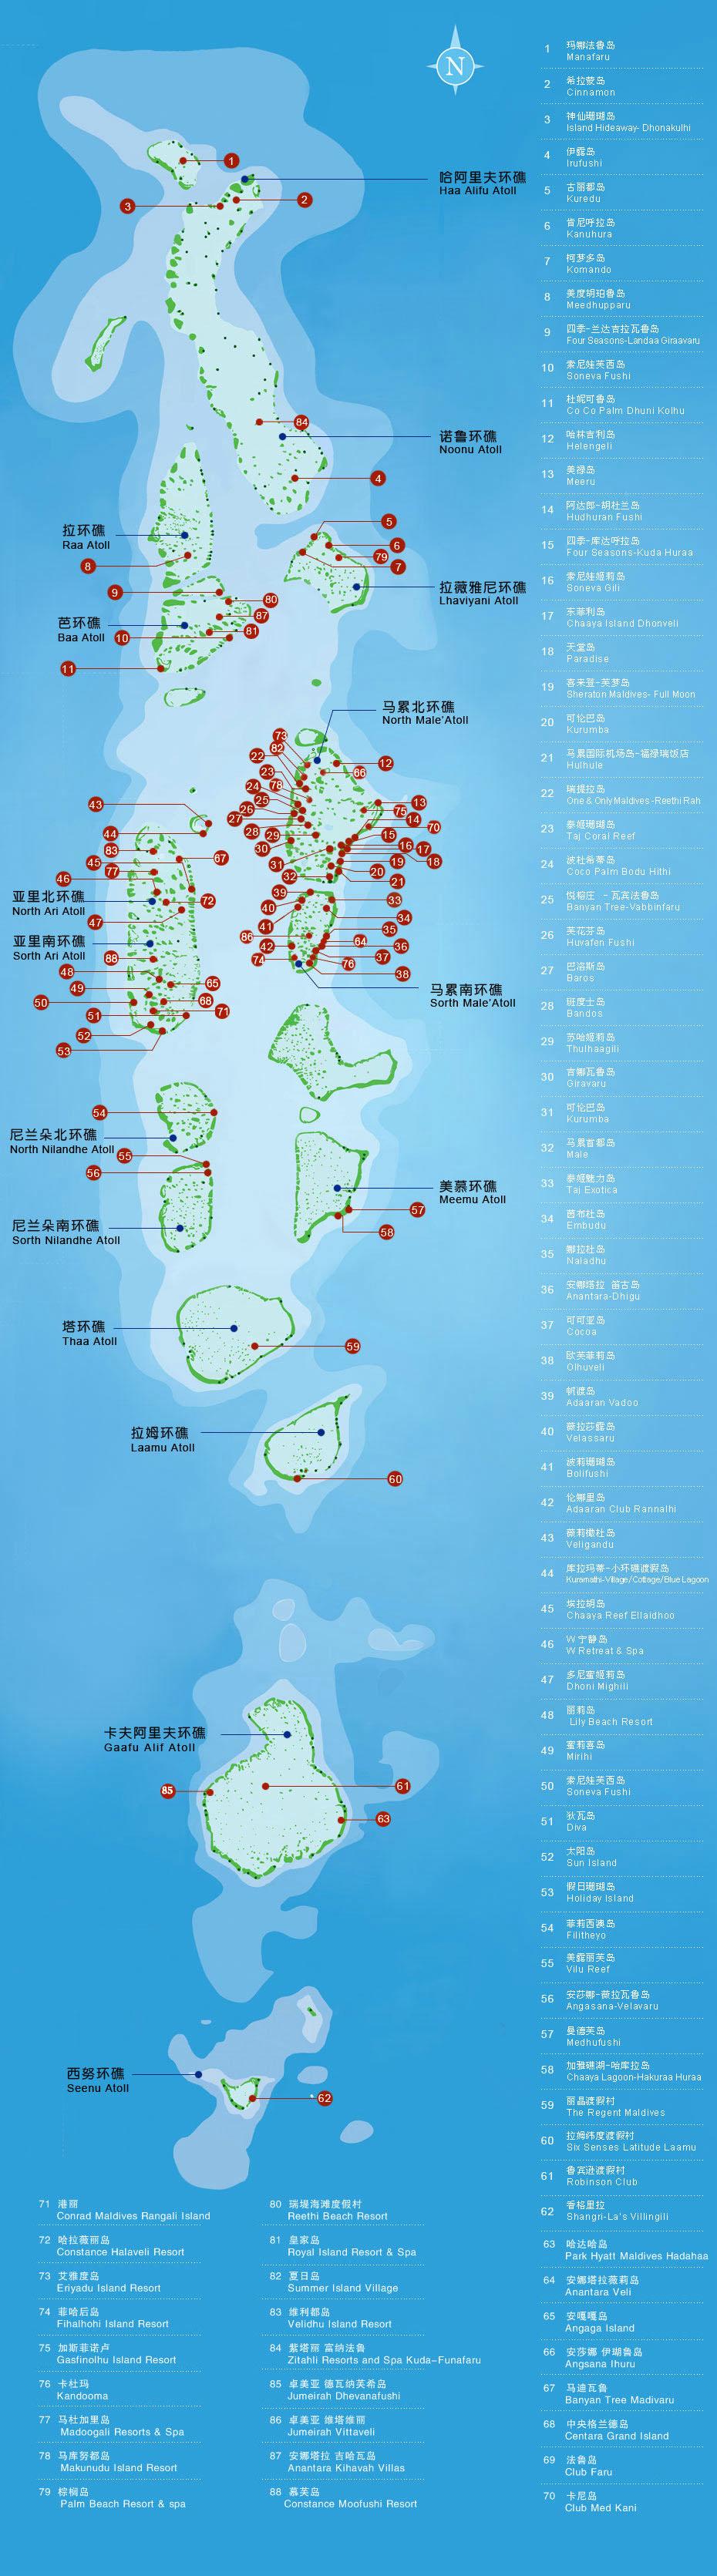 maldives攻略,  选岛指南 -百科-马尔代夫-专业代理-海岸线假期-唯一官方网站